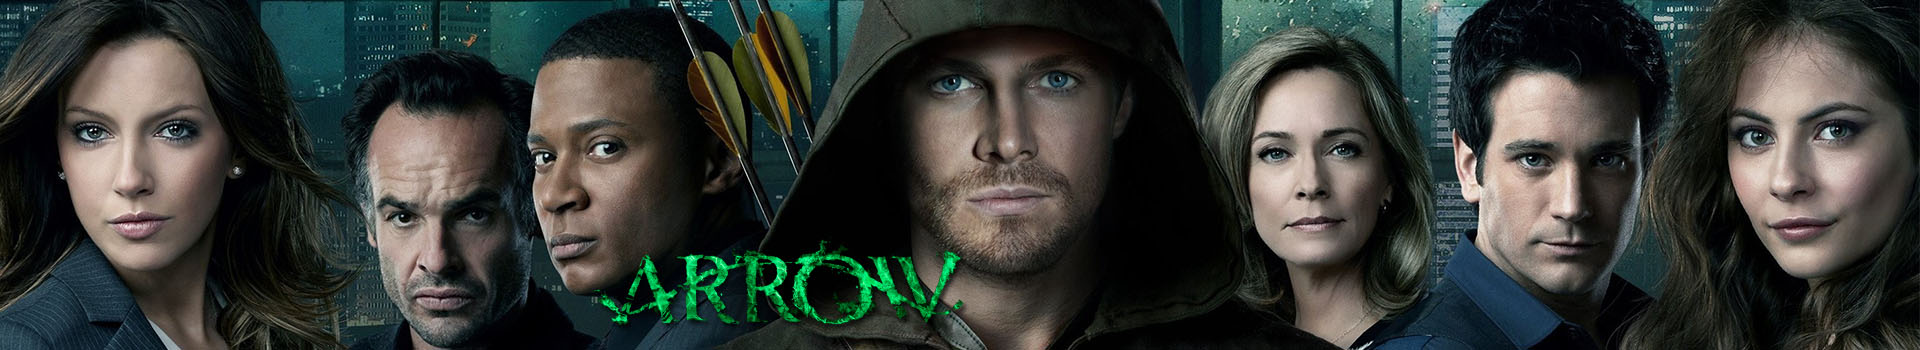 Arrow - TV Series: Figuren, Comics und Shirts